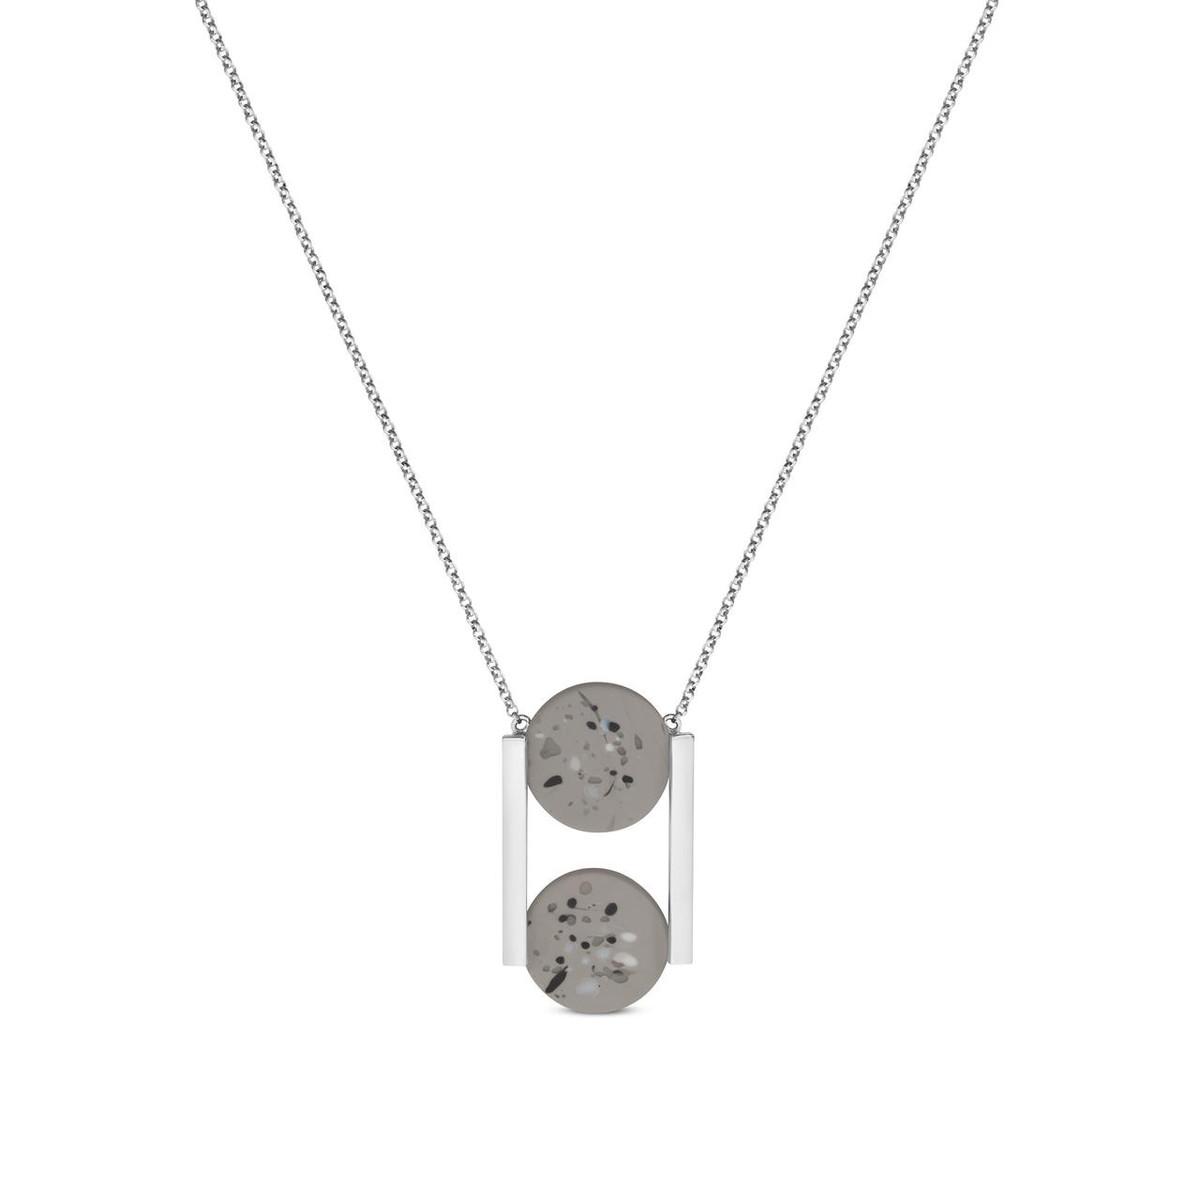 Joidart Terrazzo Double Pendant Grey Silver